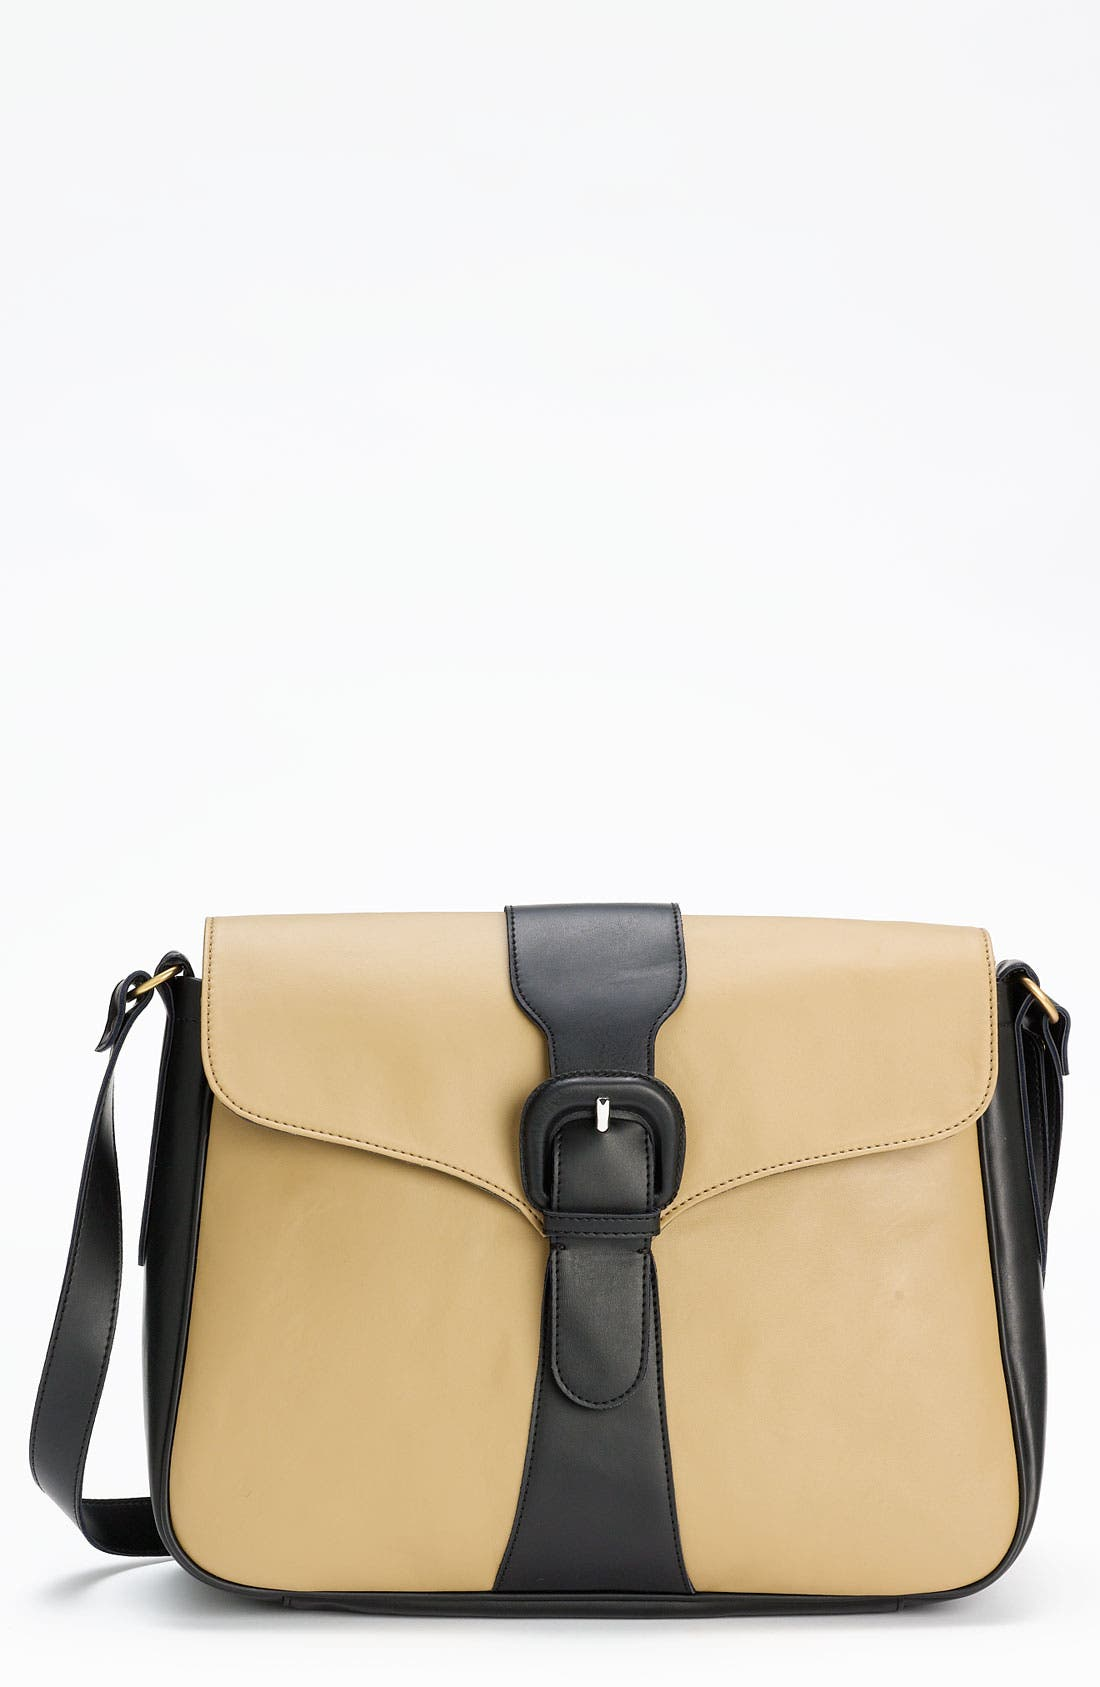 Alternate Image 1 Selected - Marni 'Medium' Shoulder Bag